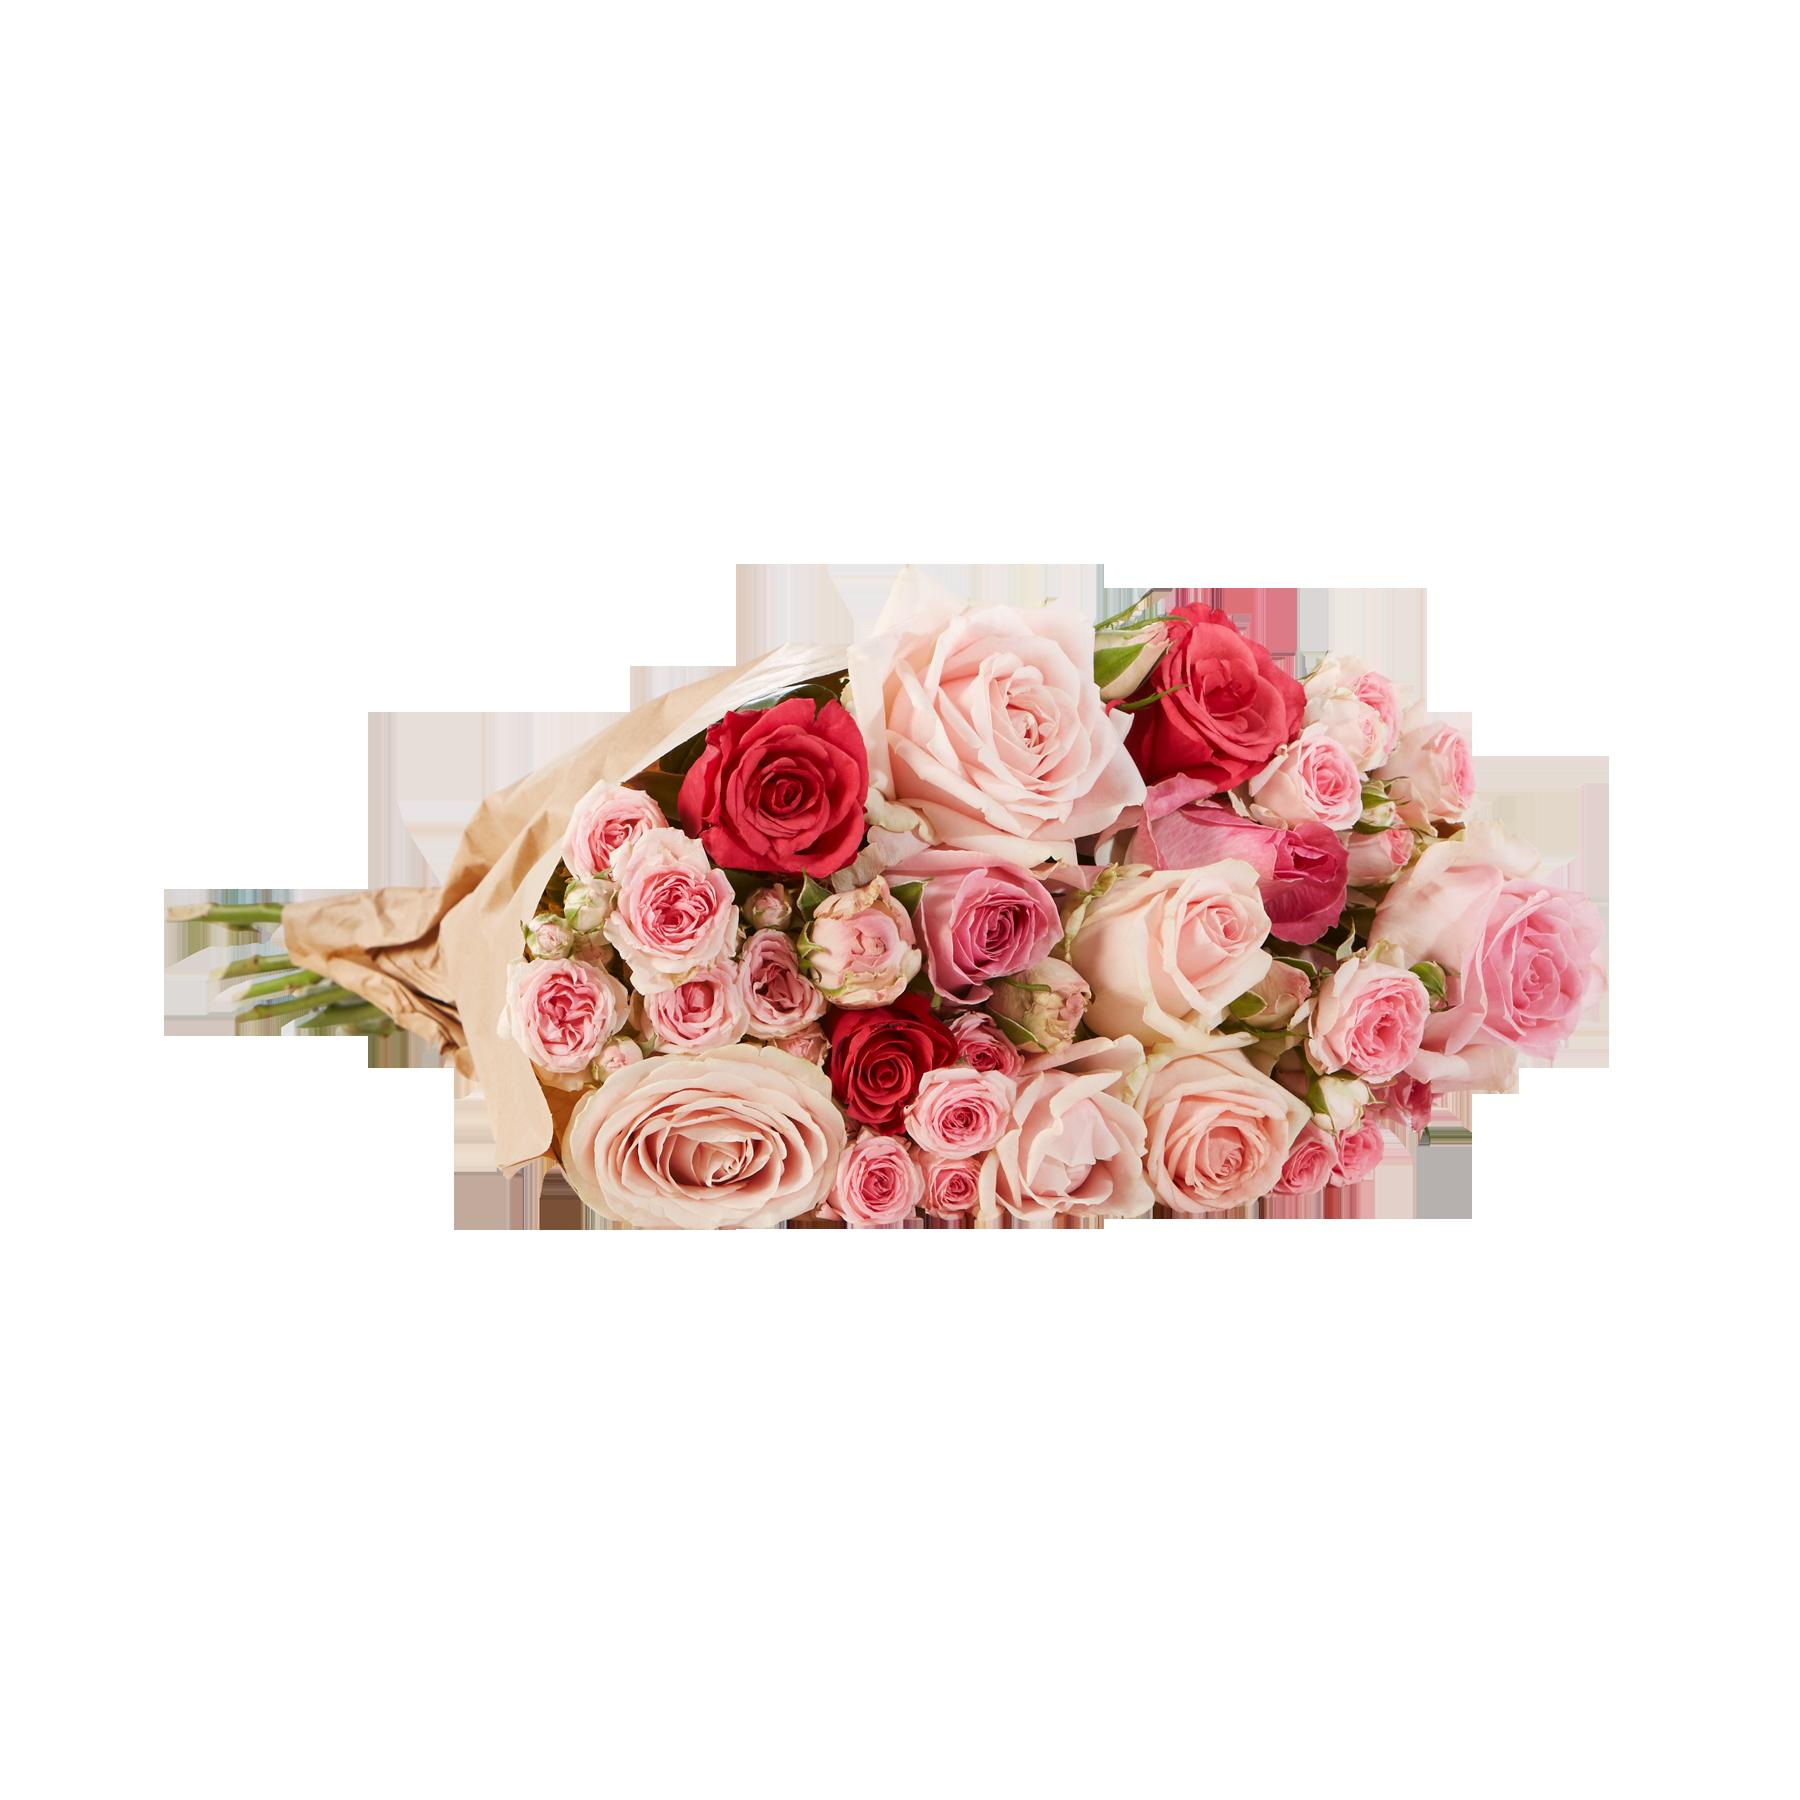 #15 Stiele Mellow Roses Größe L#